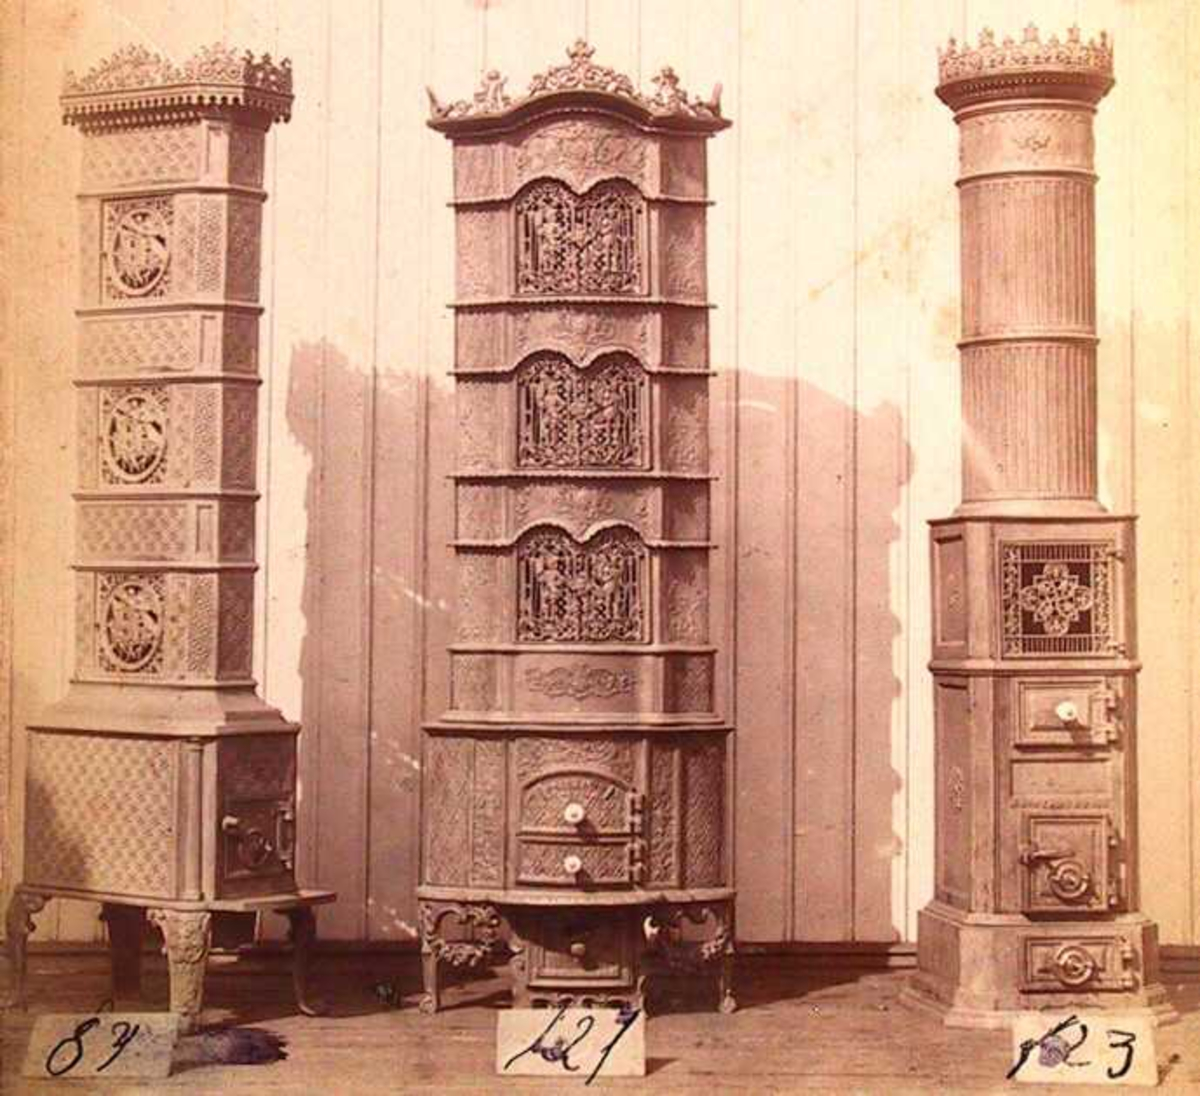 Havstad Støberis ulike produkter, på et tidspunkt, trolig i 1870-årene: Jernovner, jernkomfyrer, bryggepanner, bygningsstøpegods (jernvindusrammer), strykejernsovner, gravkors, etc.